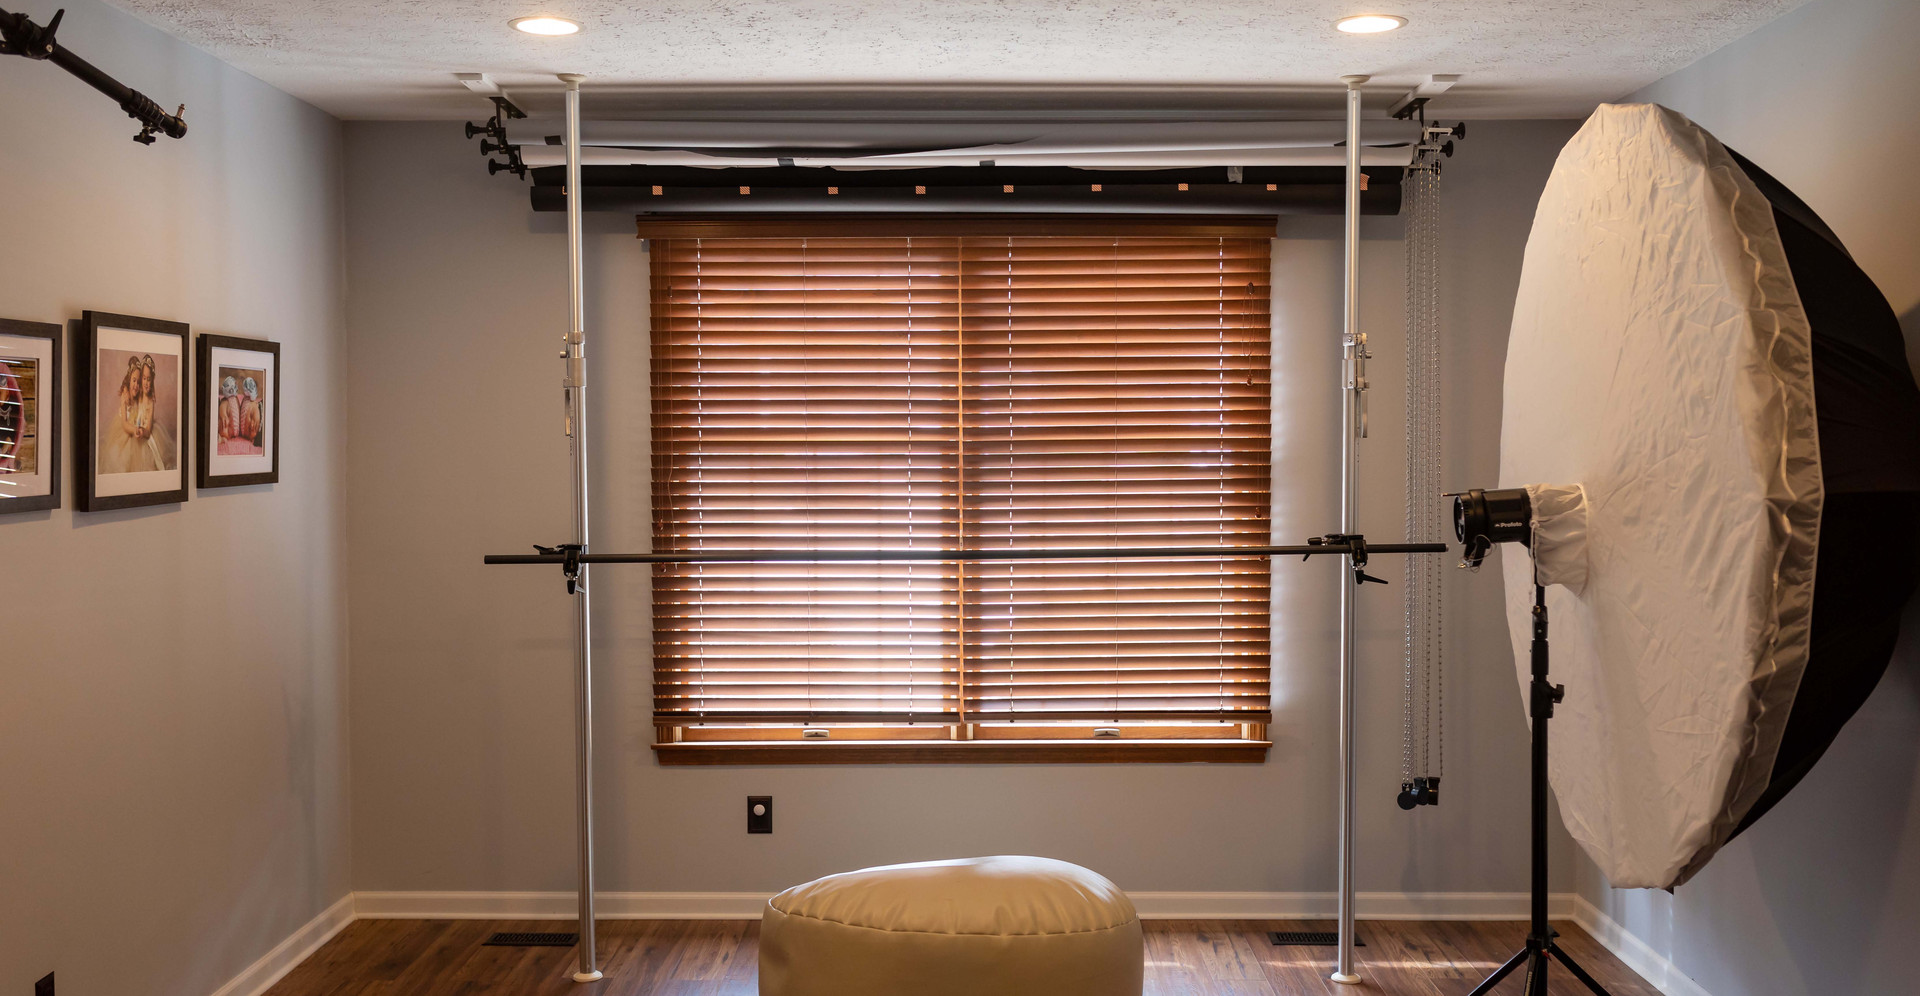 Large windows for natural light.